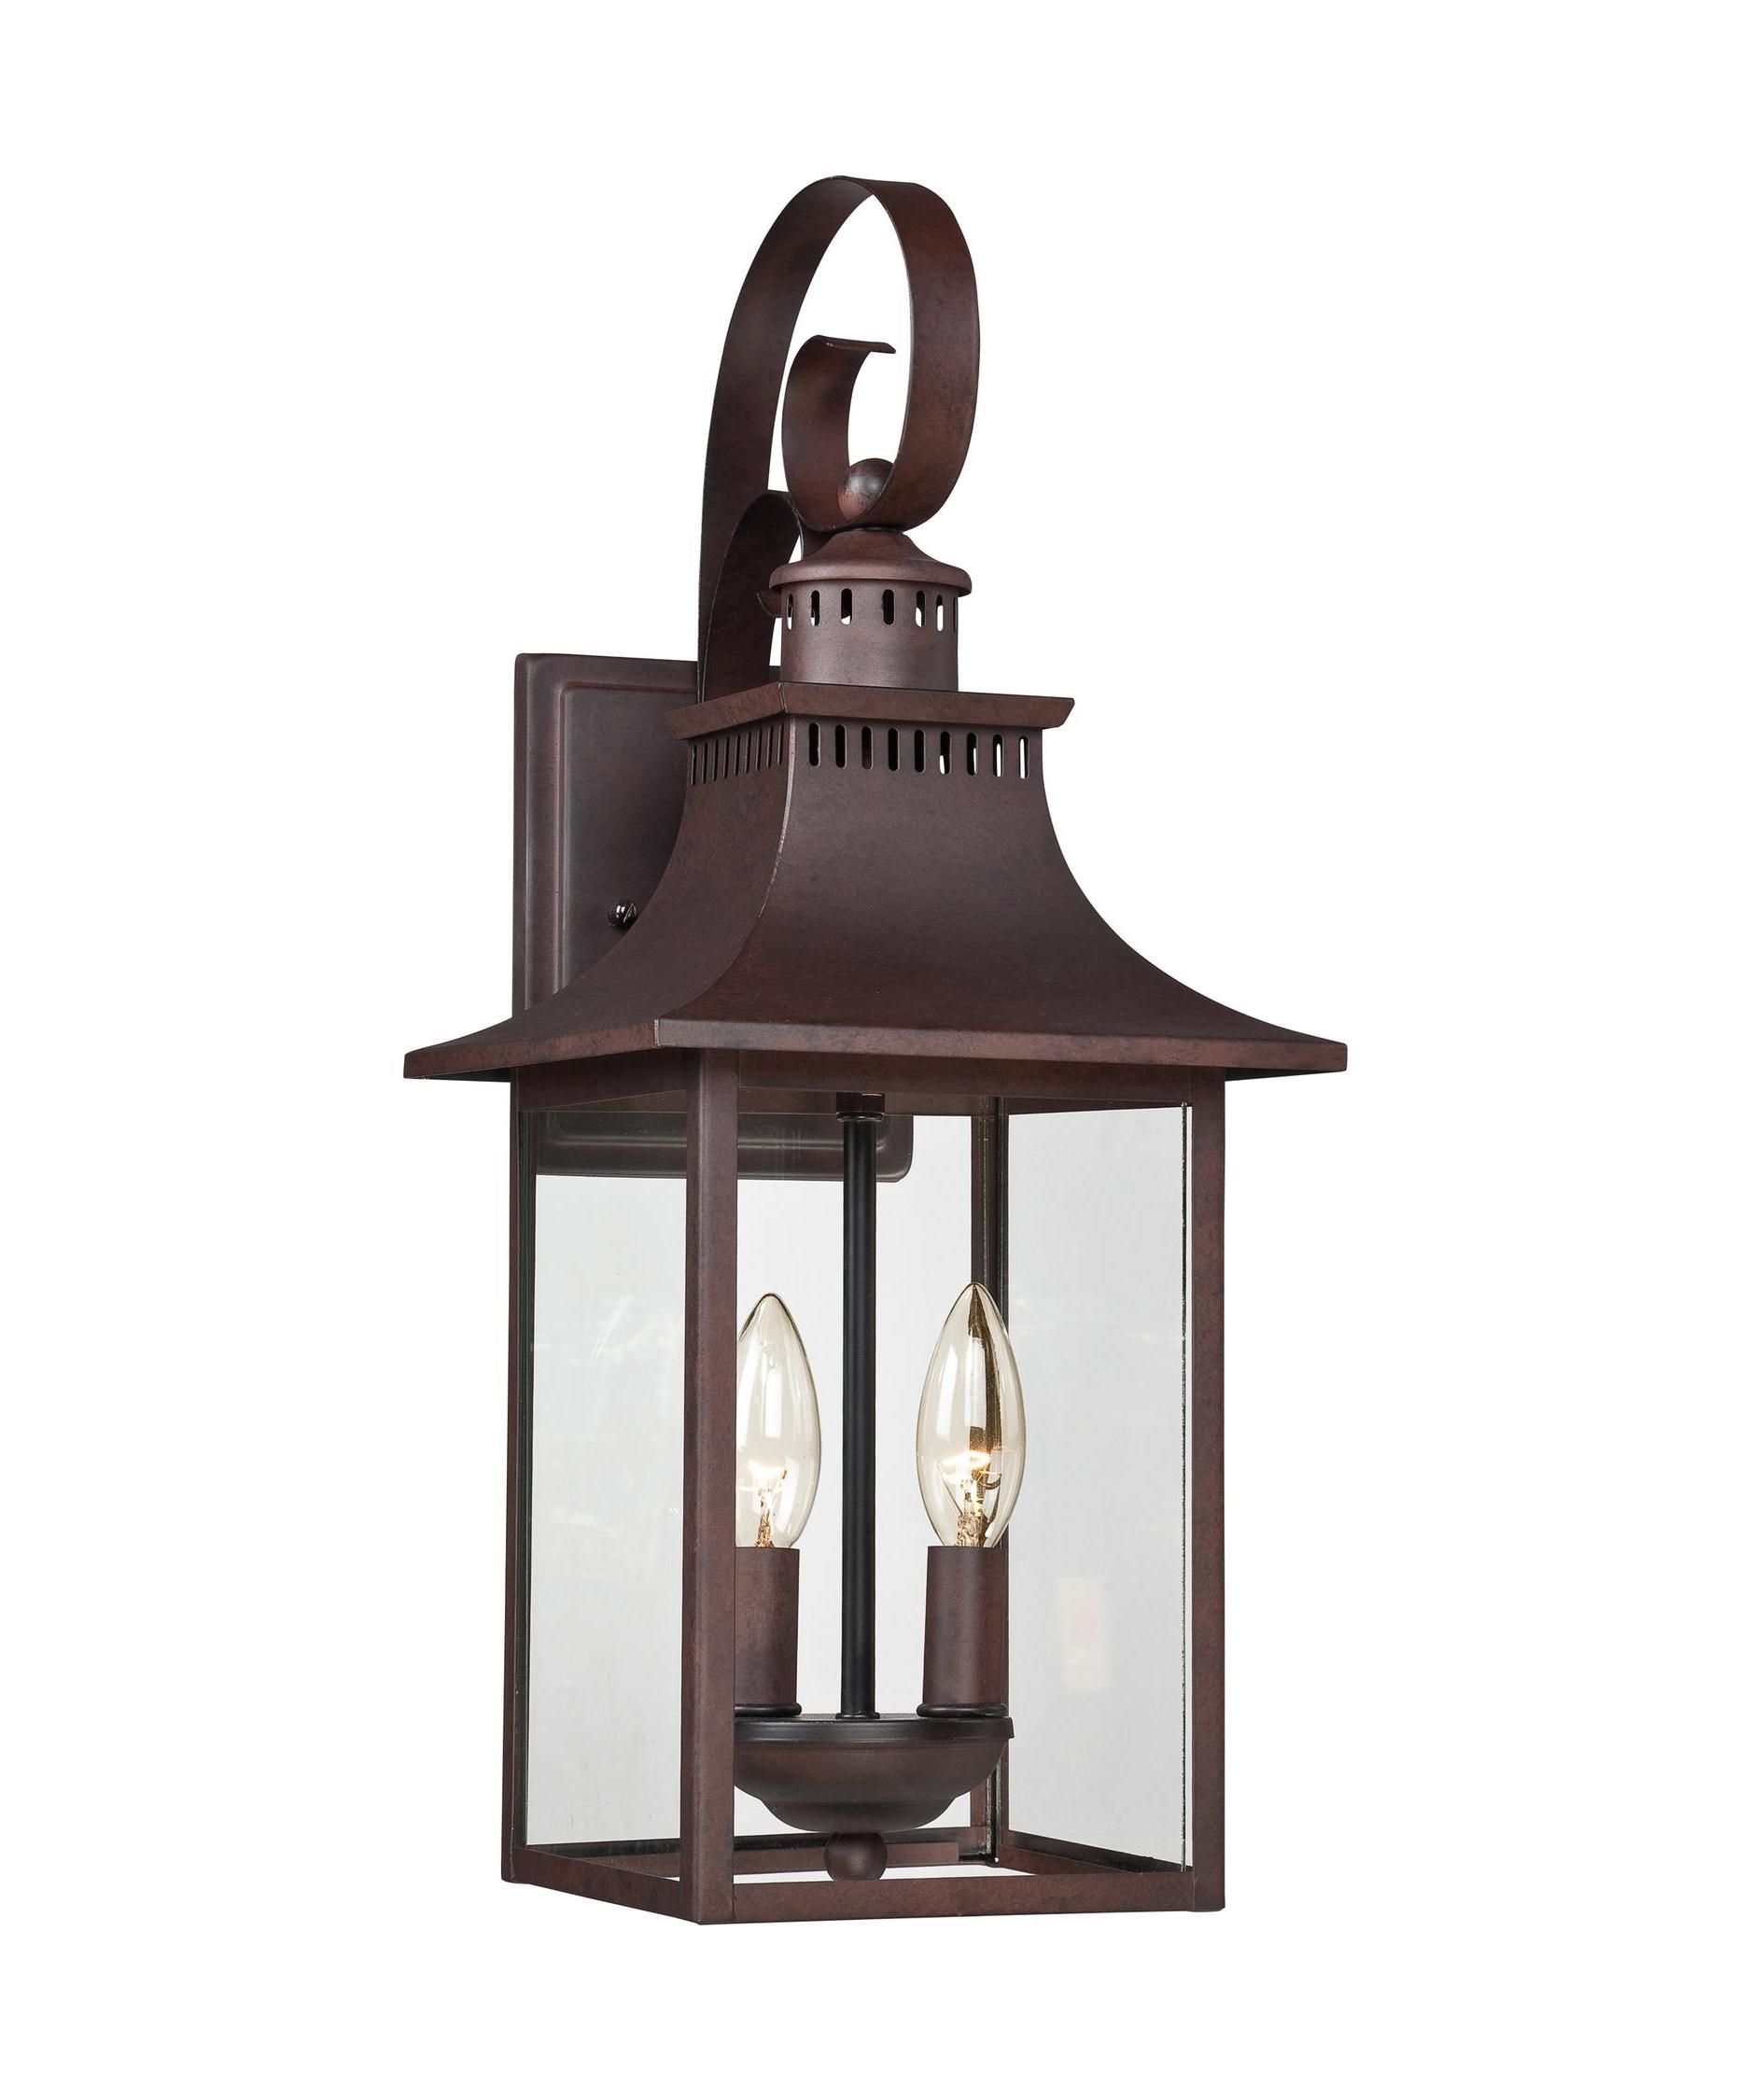 2018 Industrial Outdoor Lanterns Regarding Quoizel Ccr8408 Chancellor 8 Inch Wide 2 Light Outdoor Wall Light (View 6 of 20)